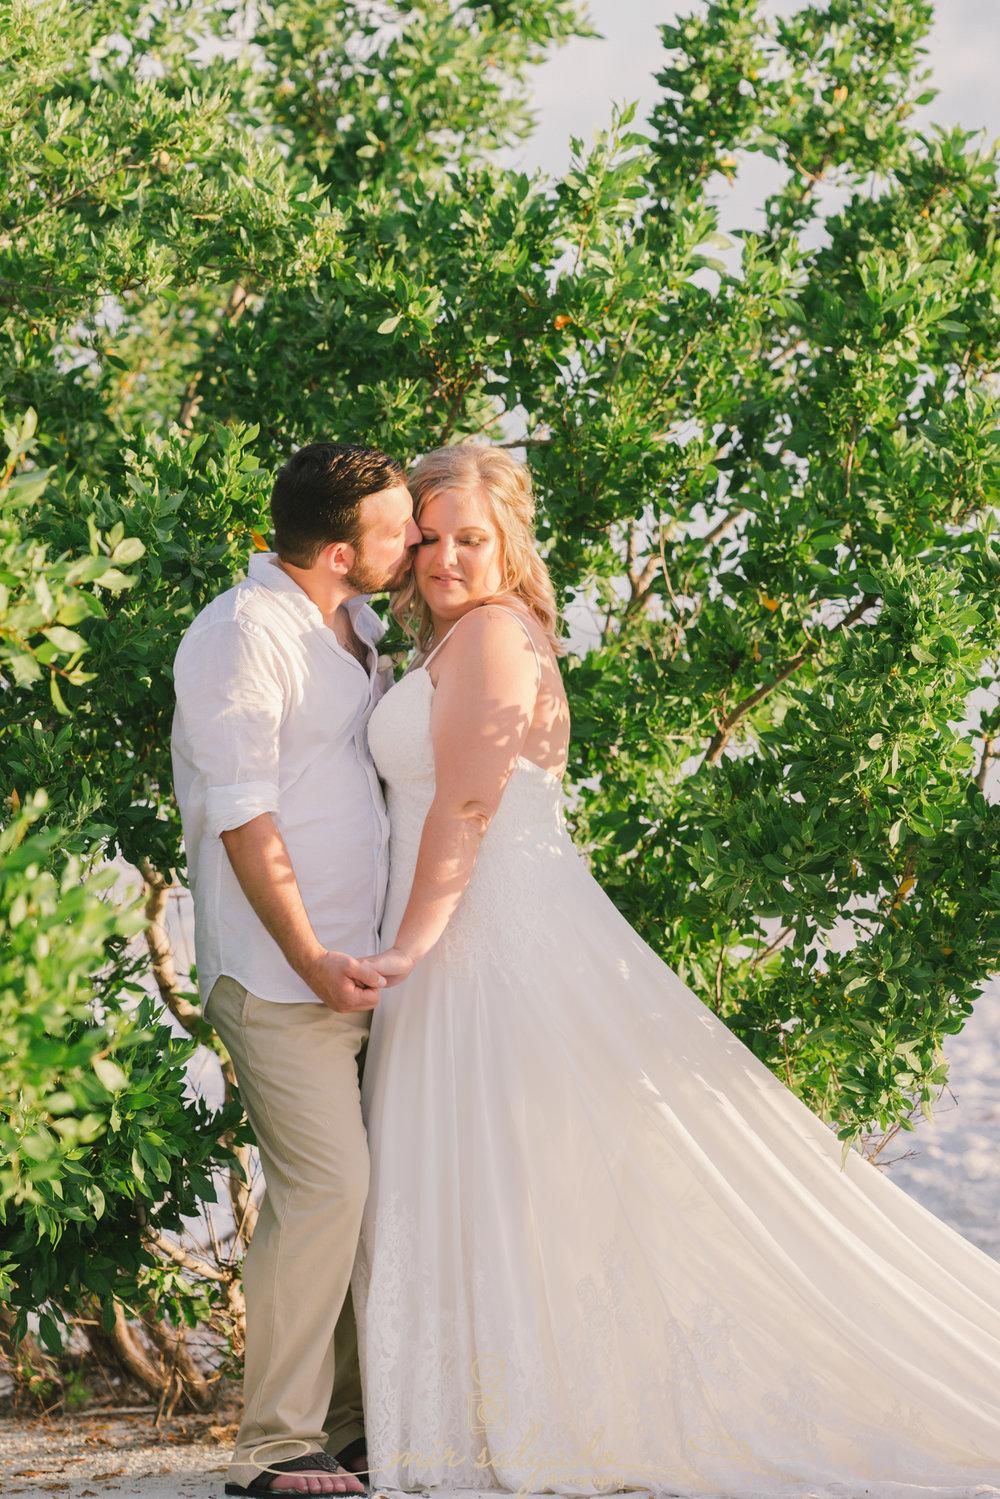 bride-and-groom-wedding-photo, beach-wedding-photo